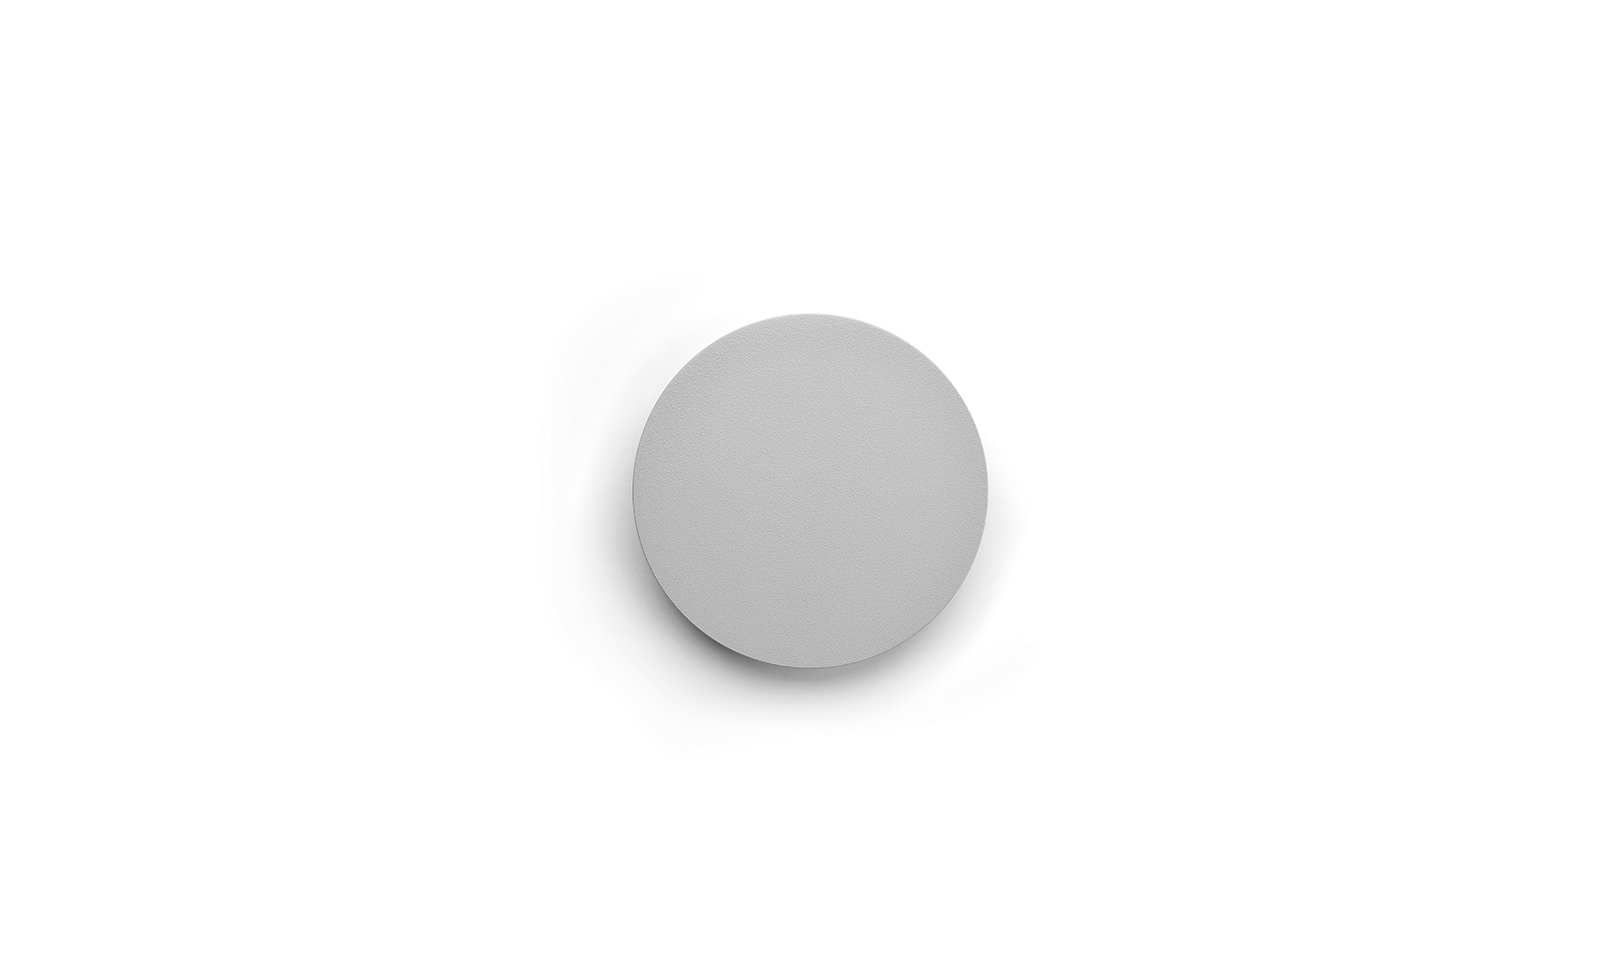 401701 ECLIPSE MINI ROUND LED 9W 3